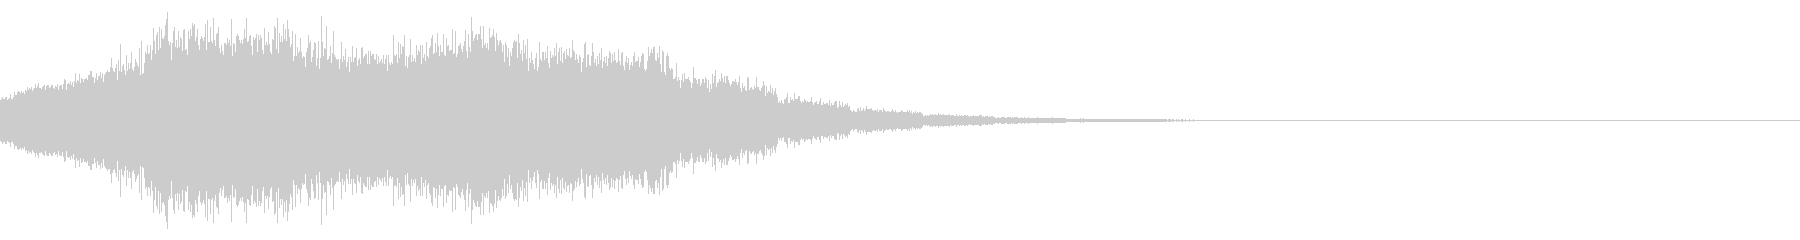 SF風効果音の未再生の波形